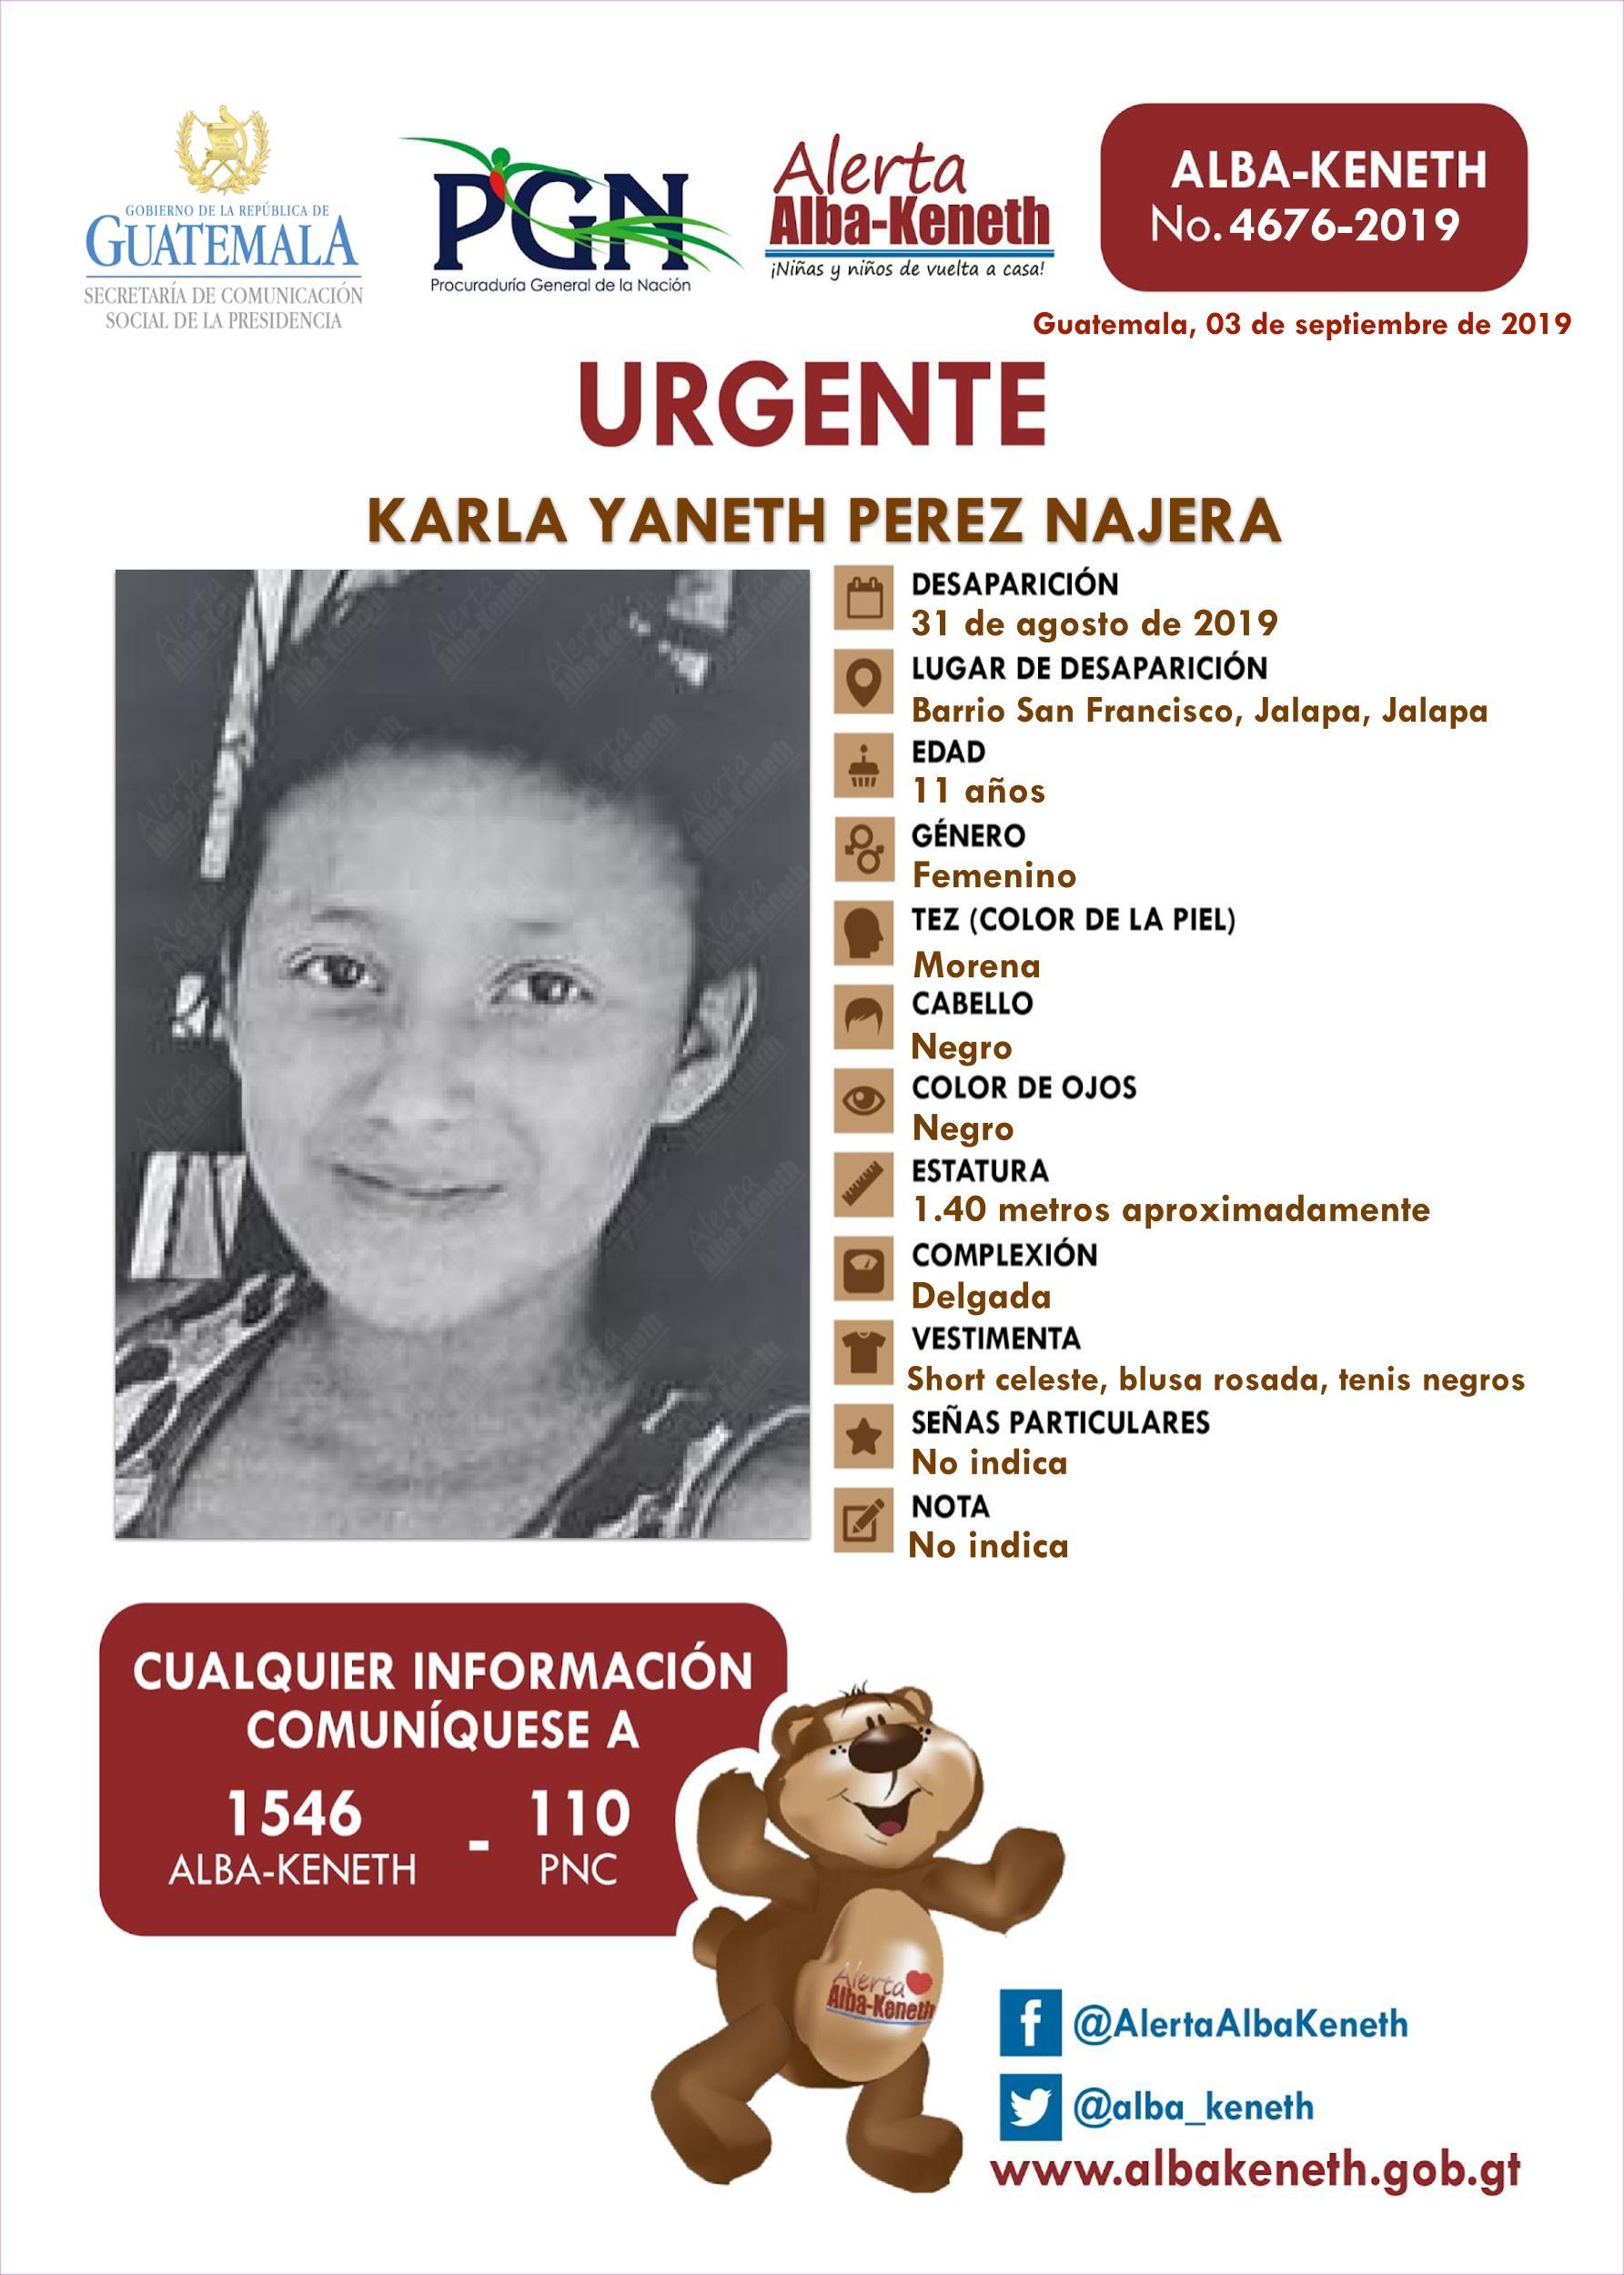 Karla Yaneth Perez Najera